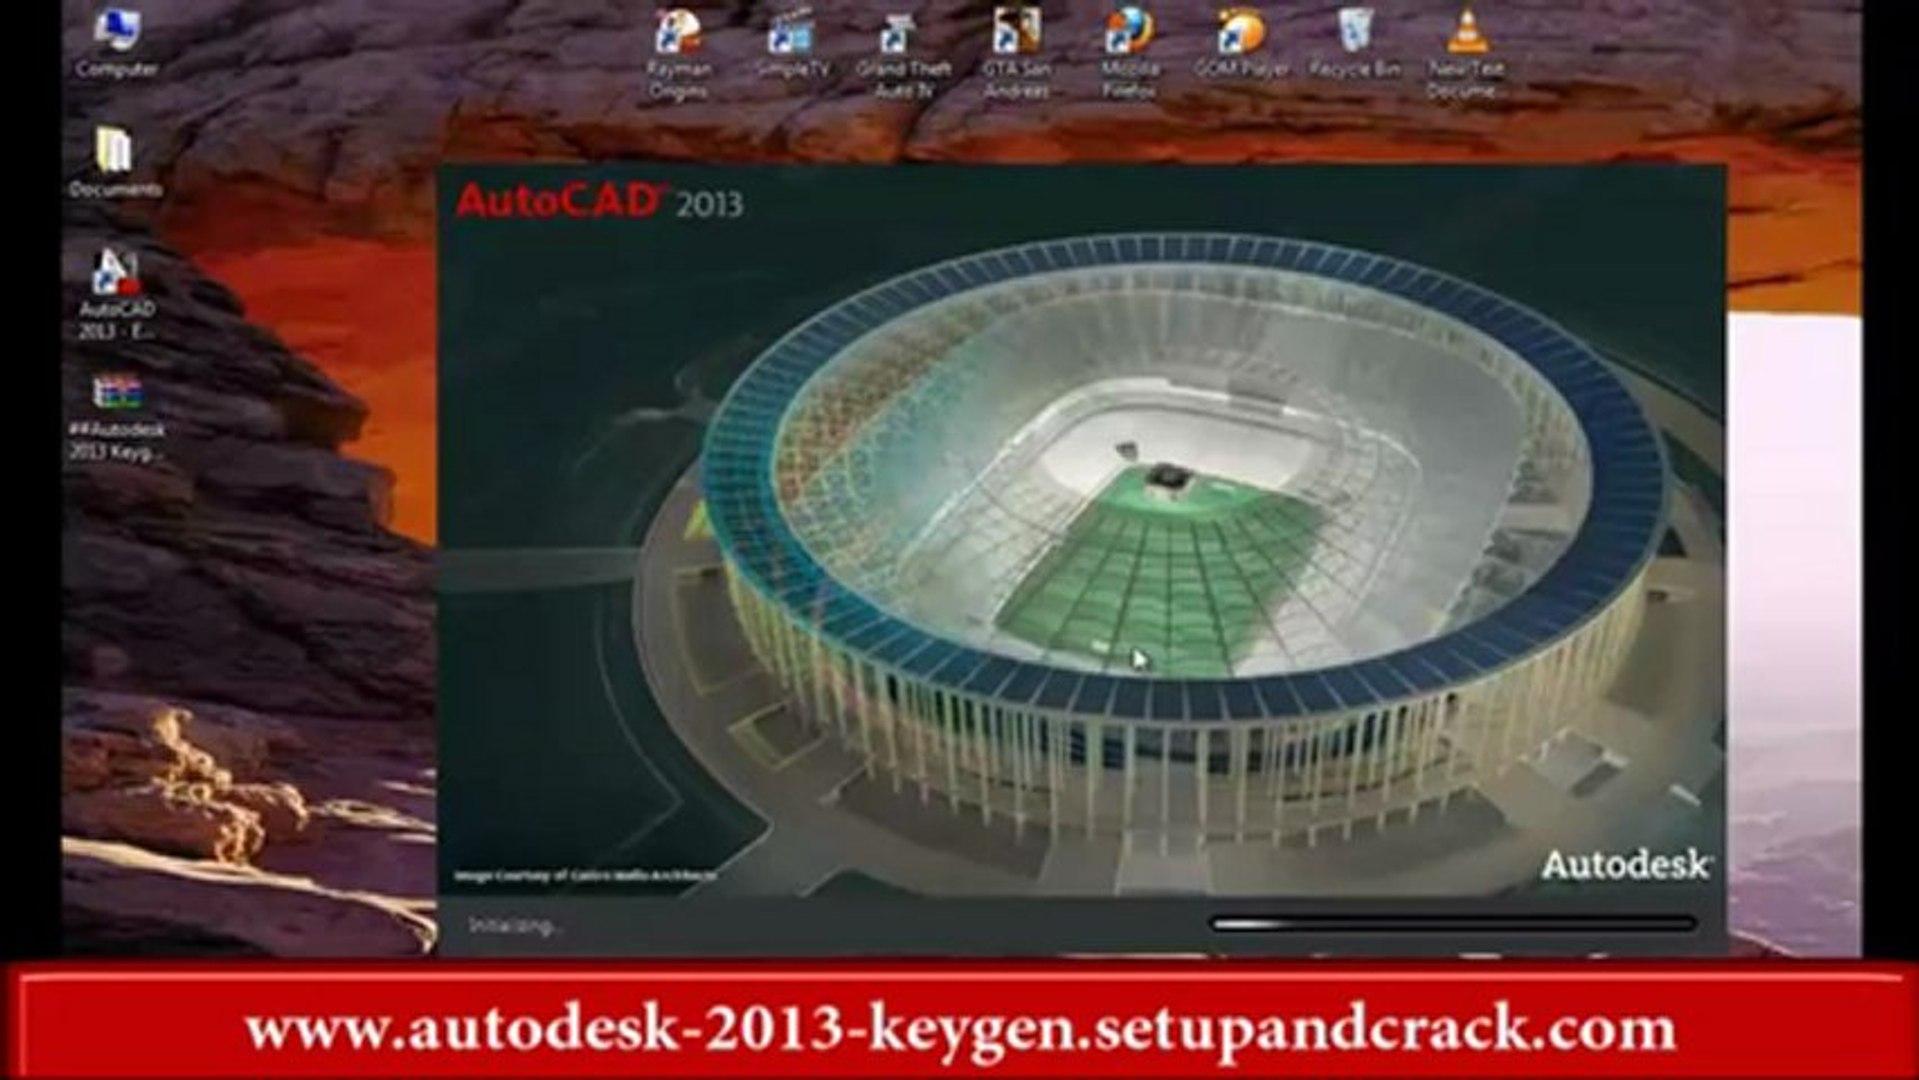 Autodesk 2013 SERIAL KEY